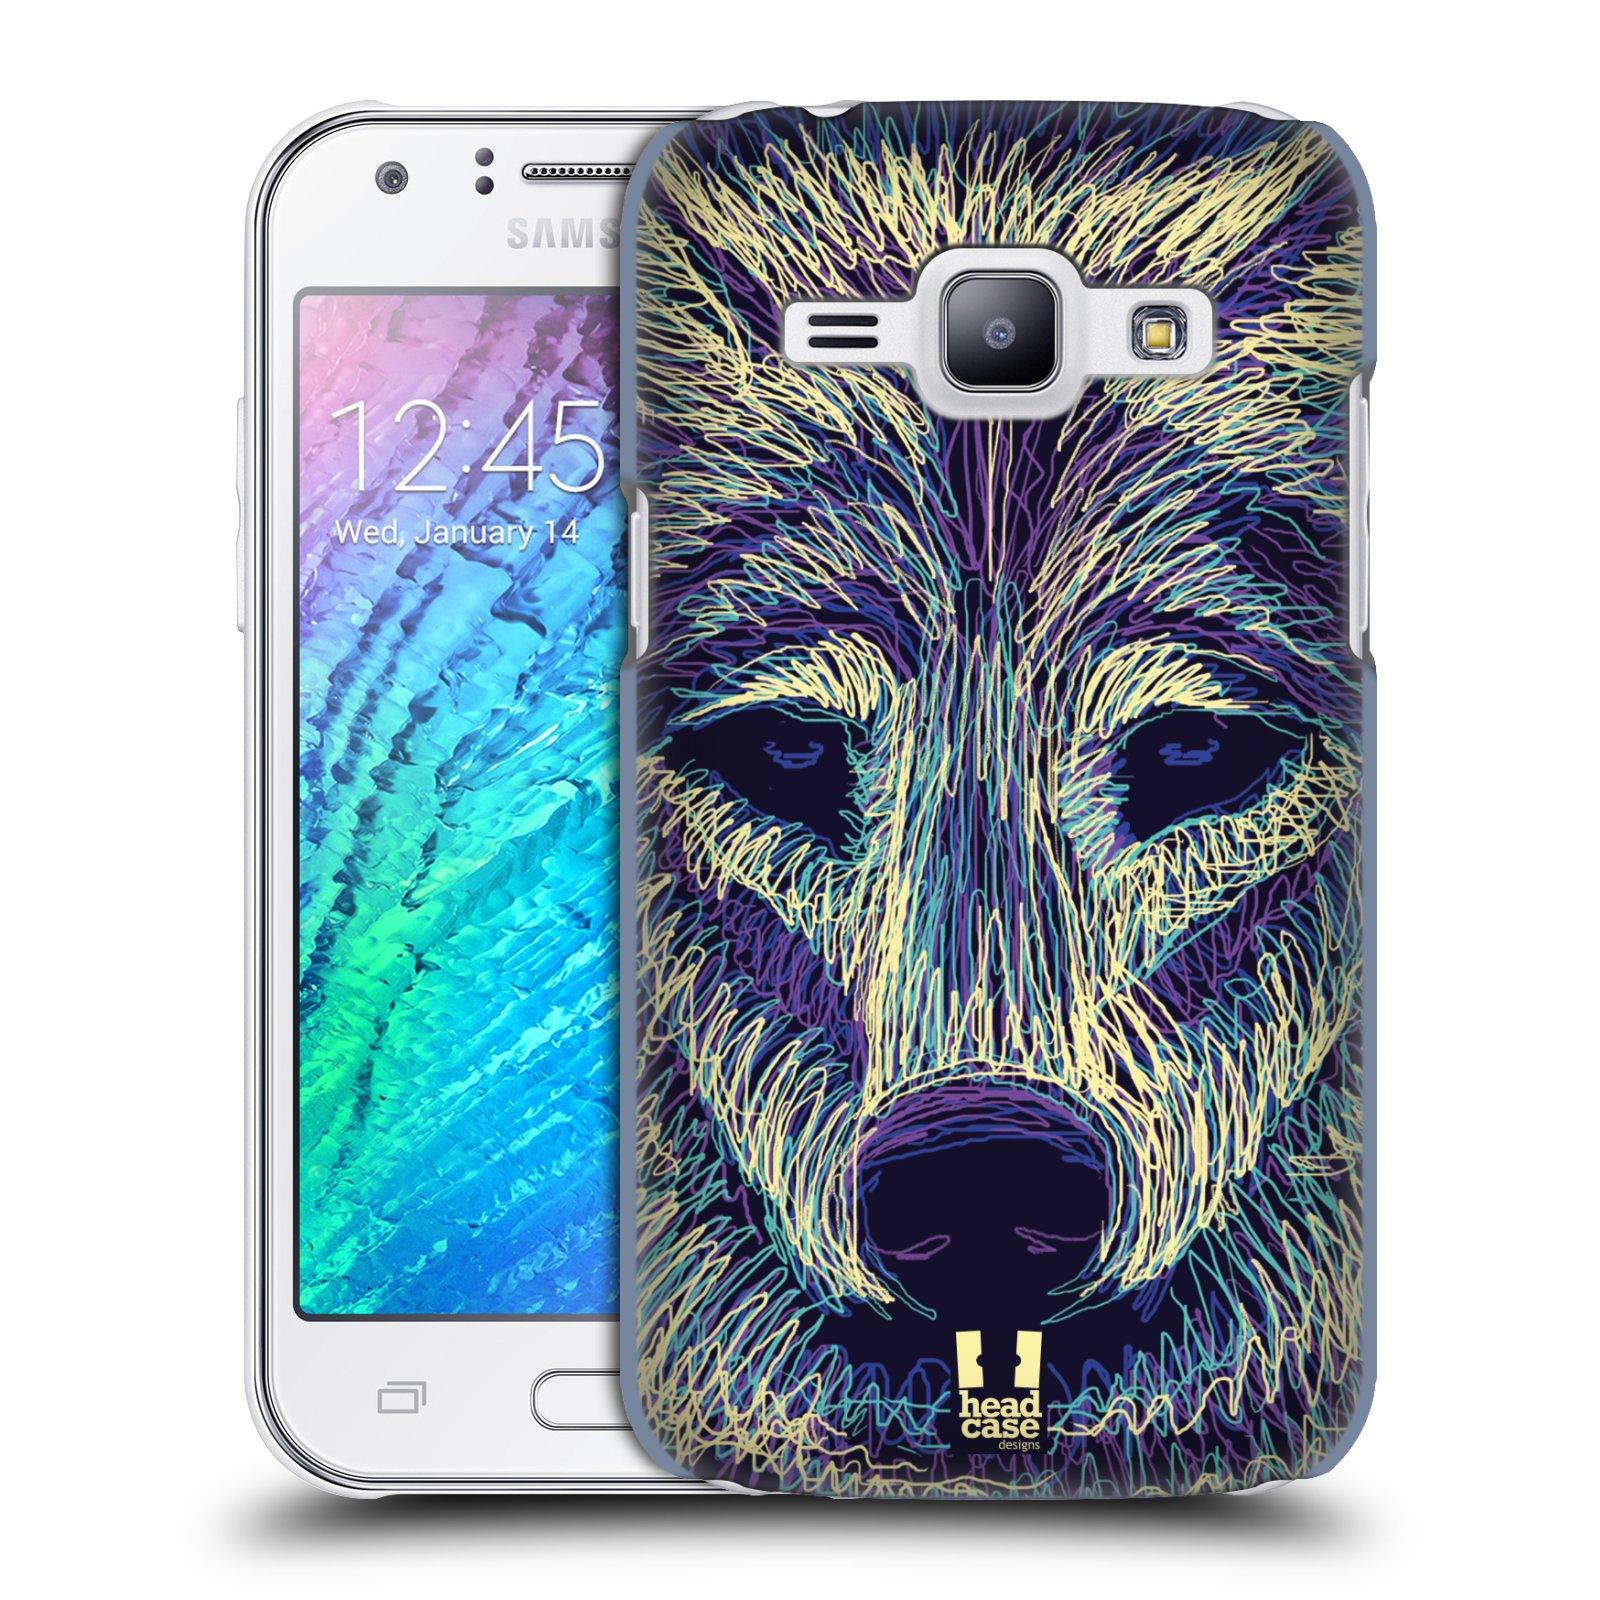 HEAD CASE plastový obal na mobil SAMSUNG Galaxy J1, J100 vzor zvíře čmáranice vlk